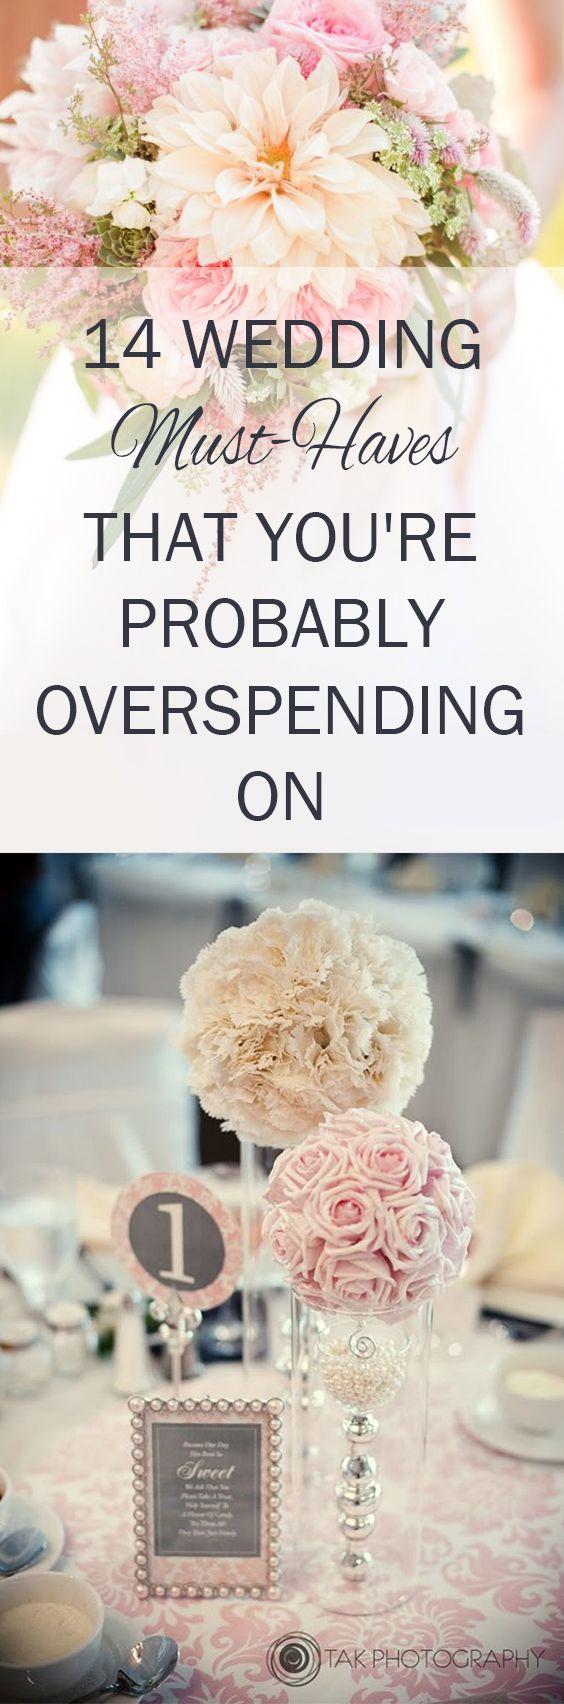 Best 20+ Inexpensive Wedding Flowers Ideas On Pinterest   Inexpensive  Wedding Centerpieces, Inexpensive Centerpieces And Diy Wedding Centerpieces